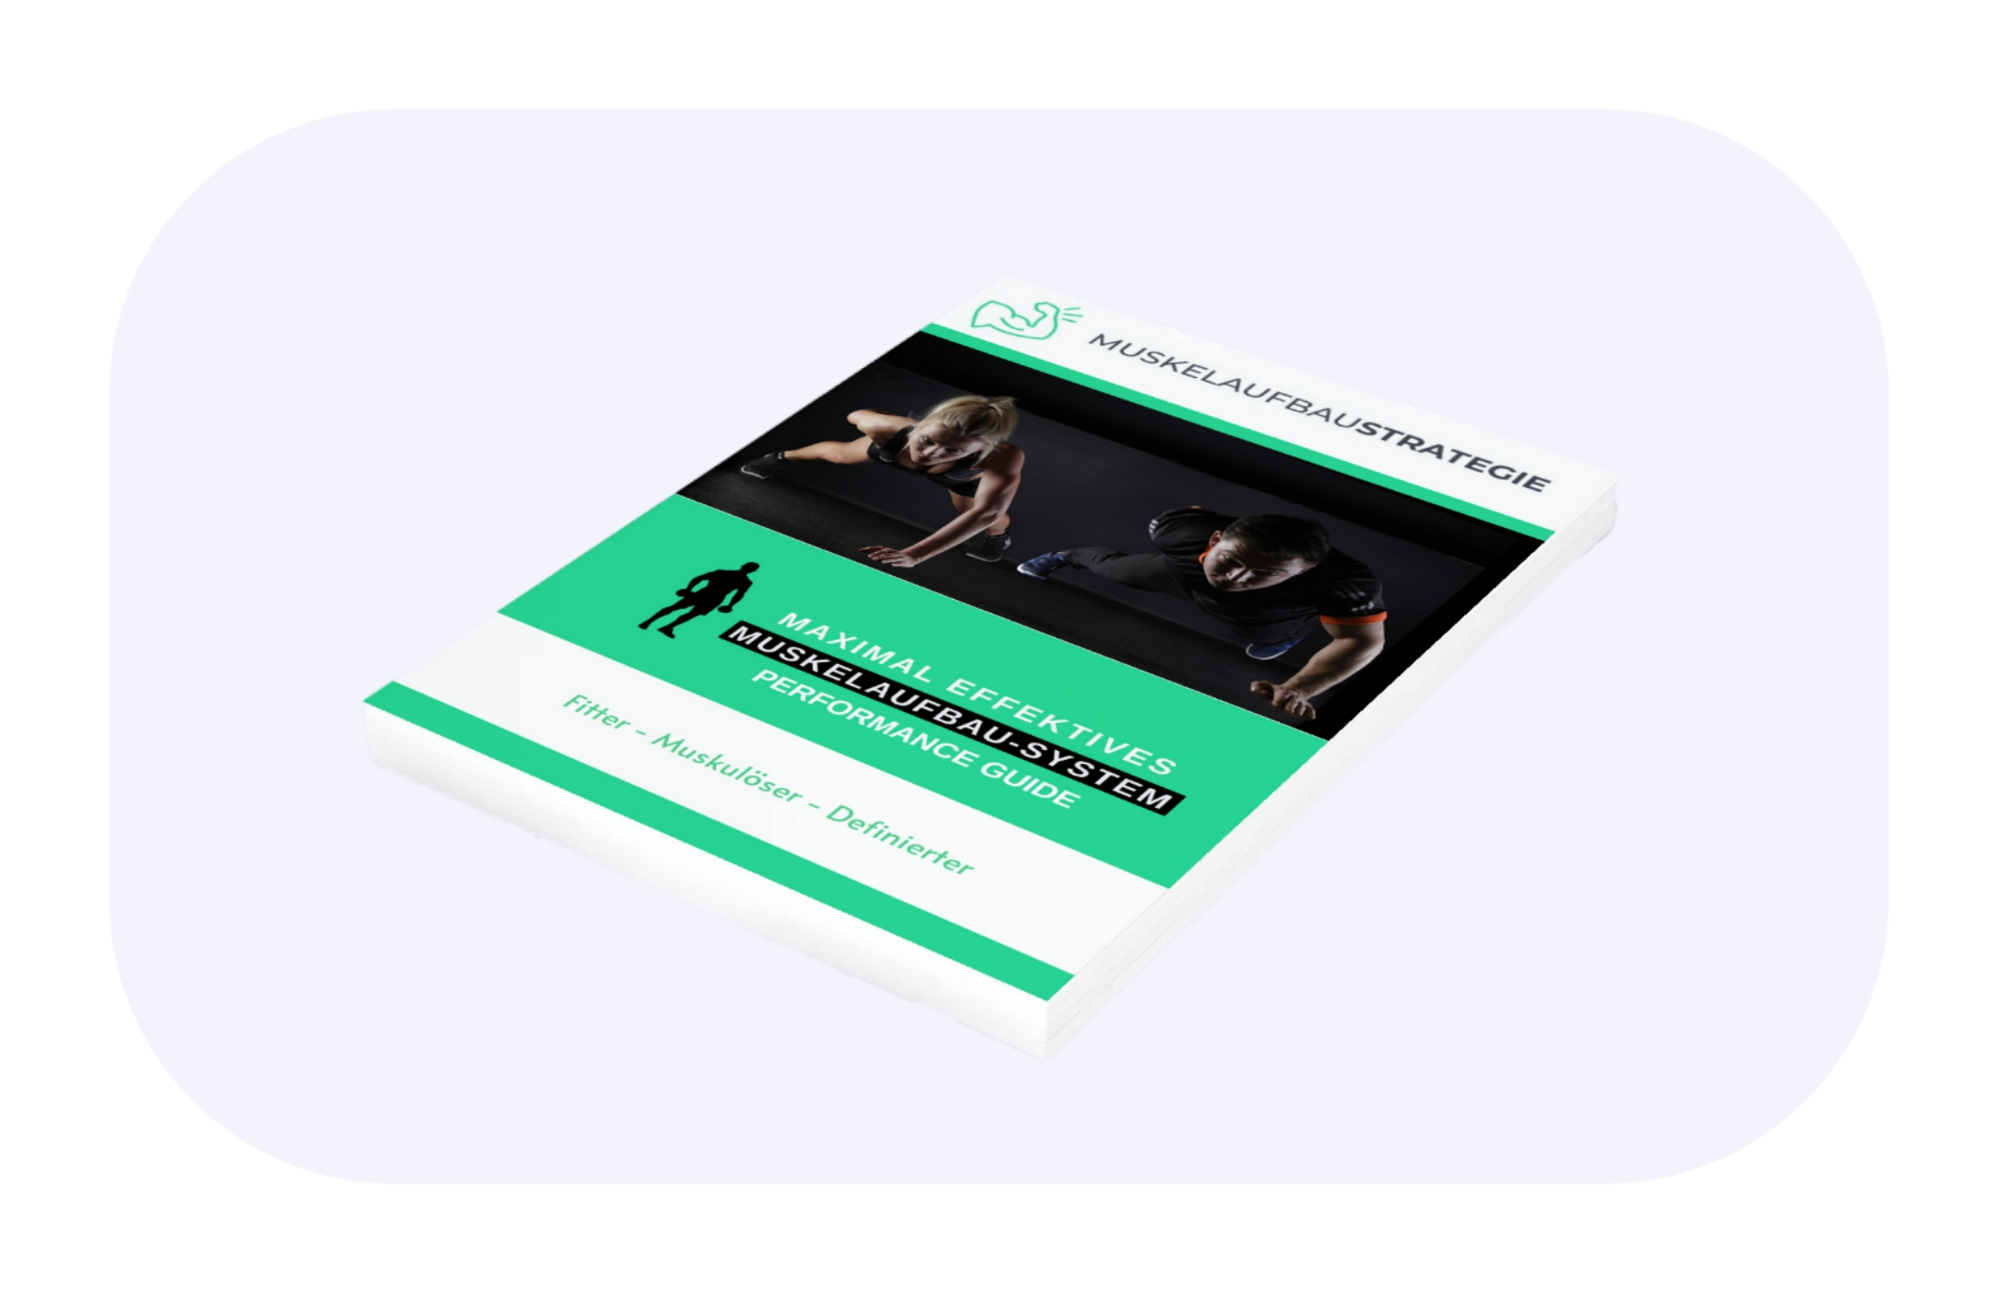 Muskelaufbau, Fitness, Ebook, Performance Guide